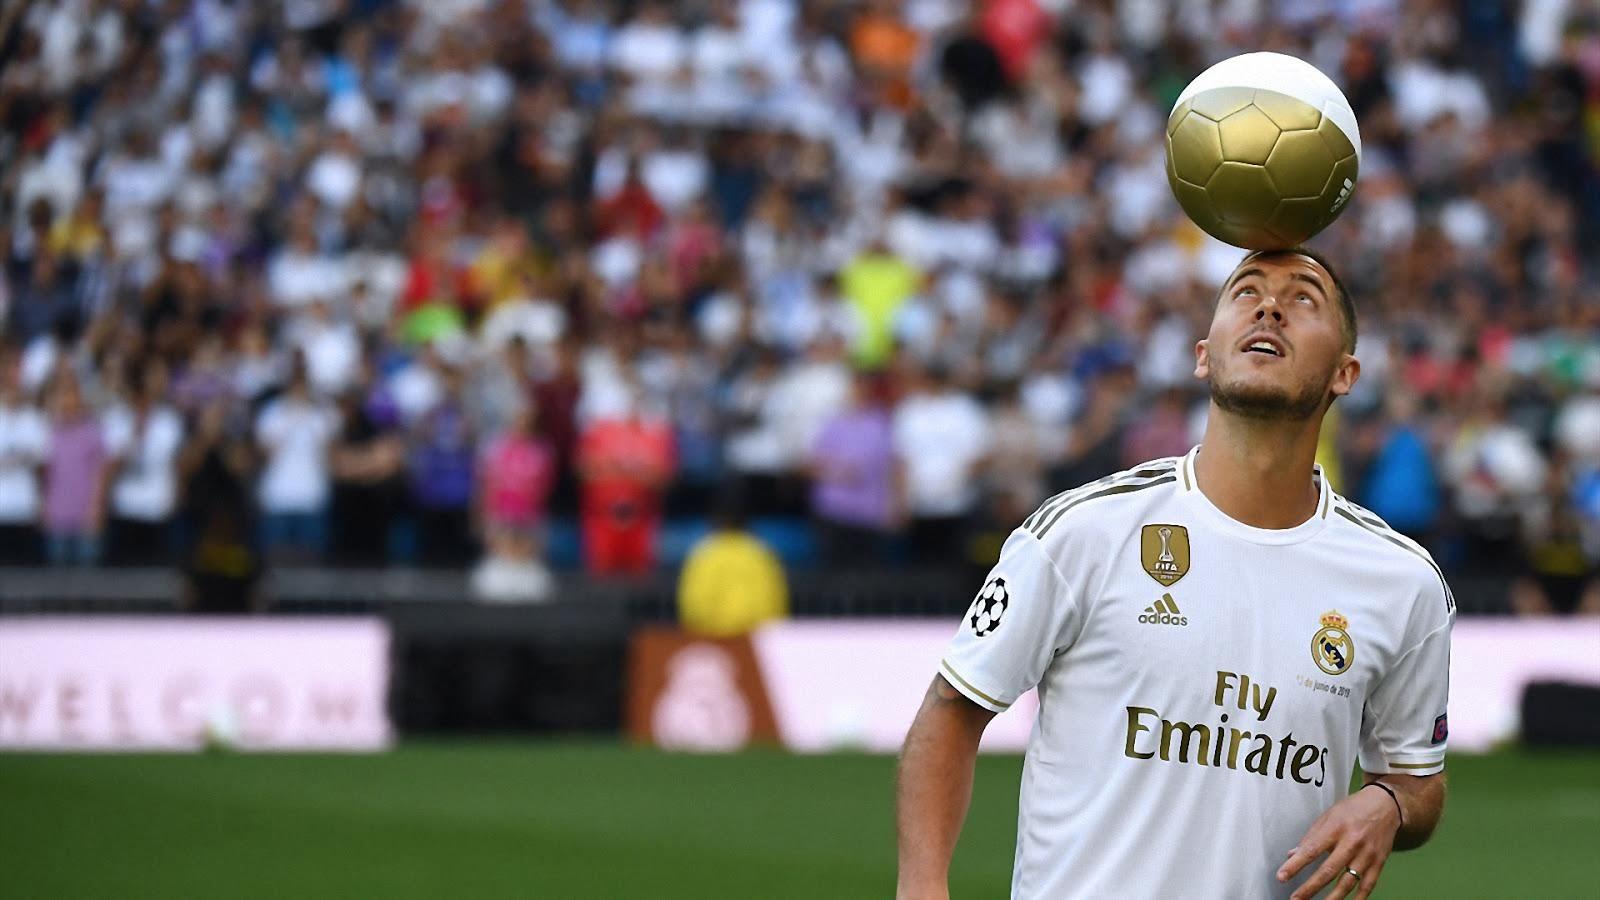 Eden Hazard Real Madrid Hd Wallpaper Free Download Hipi Info